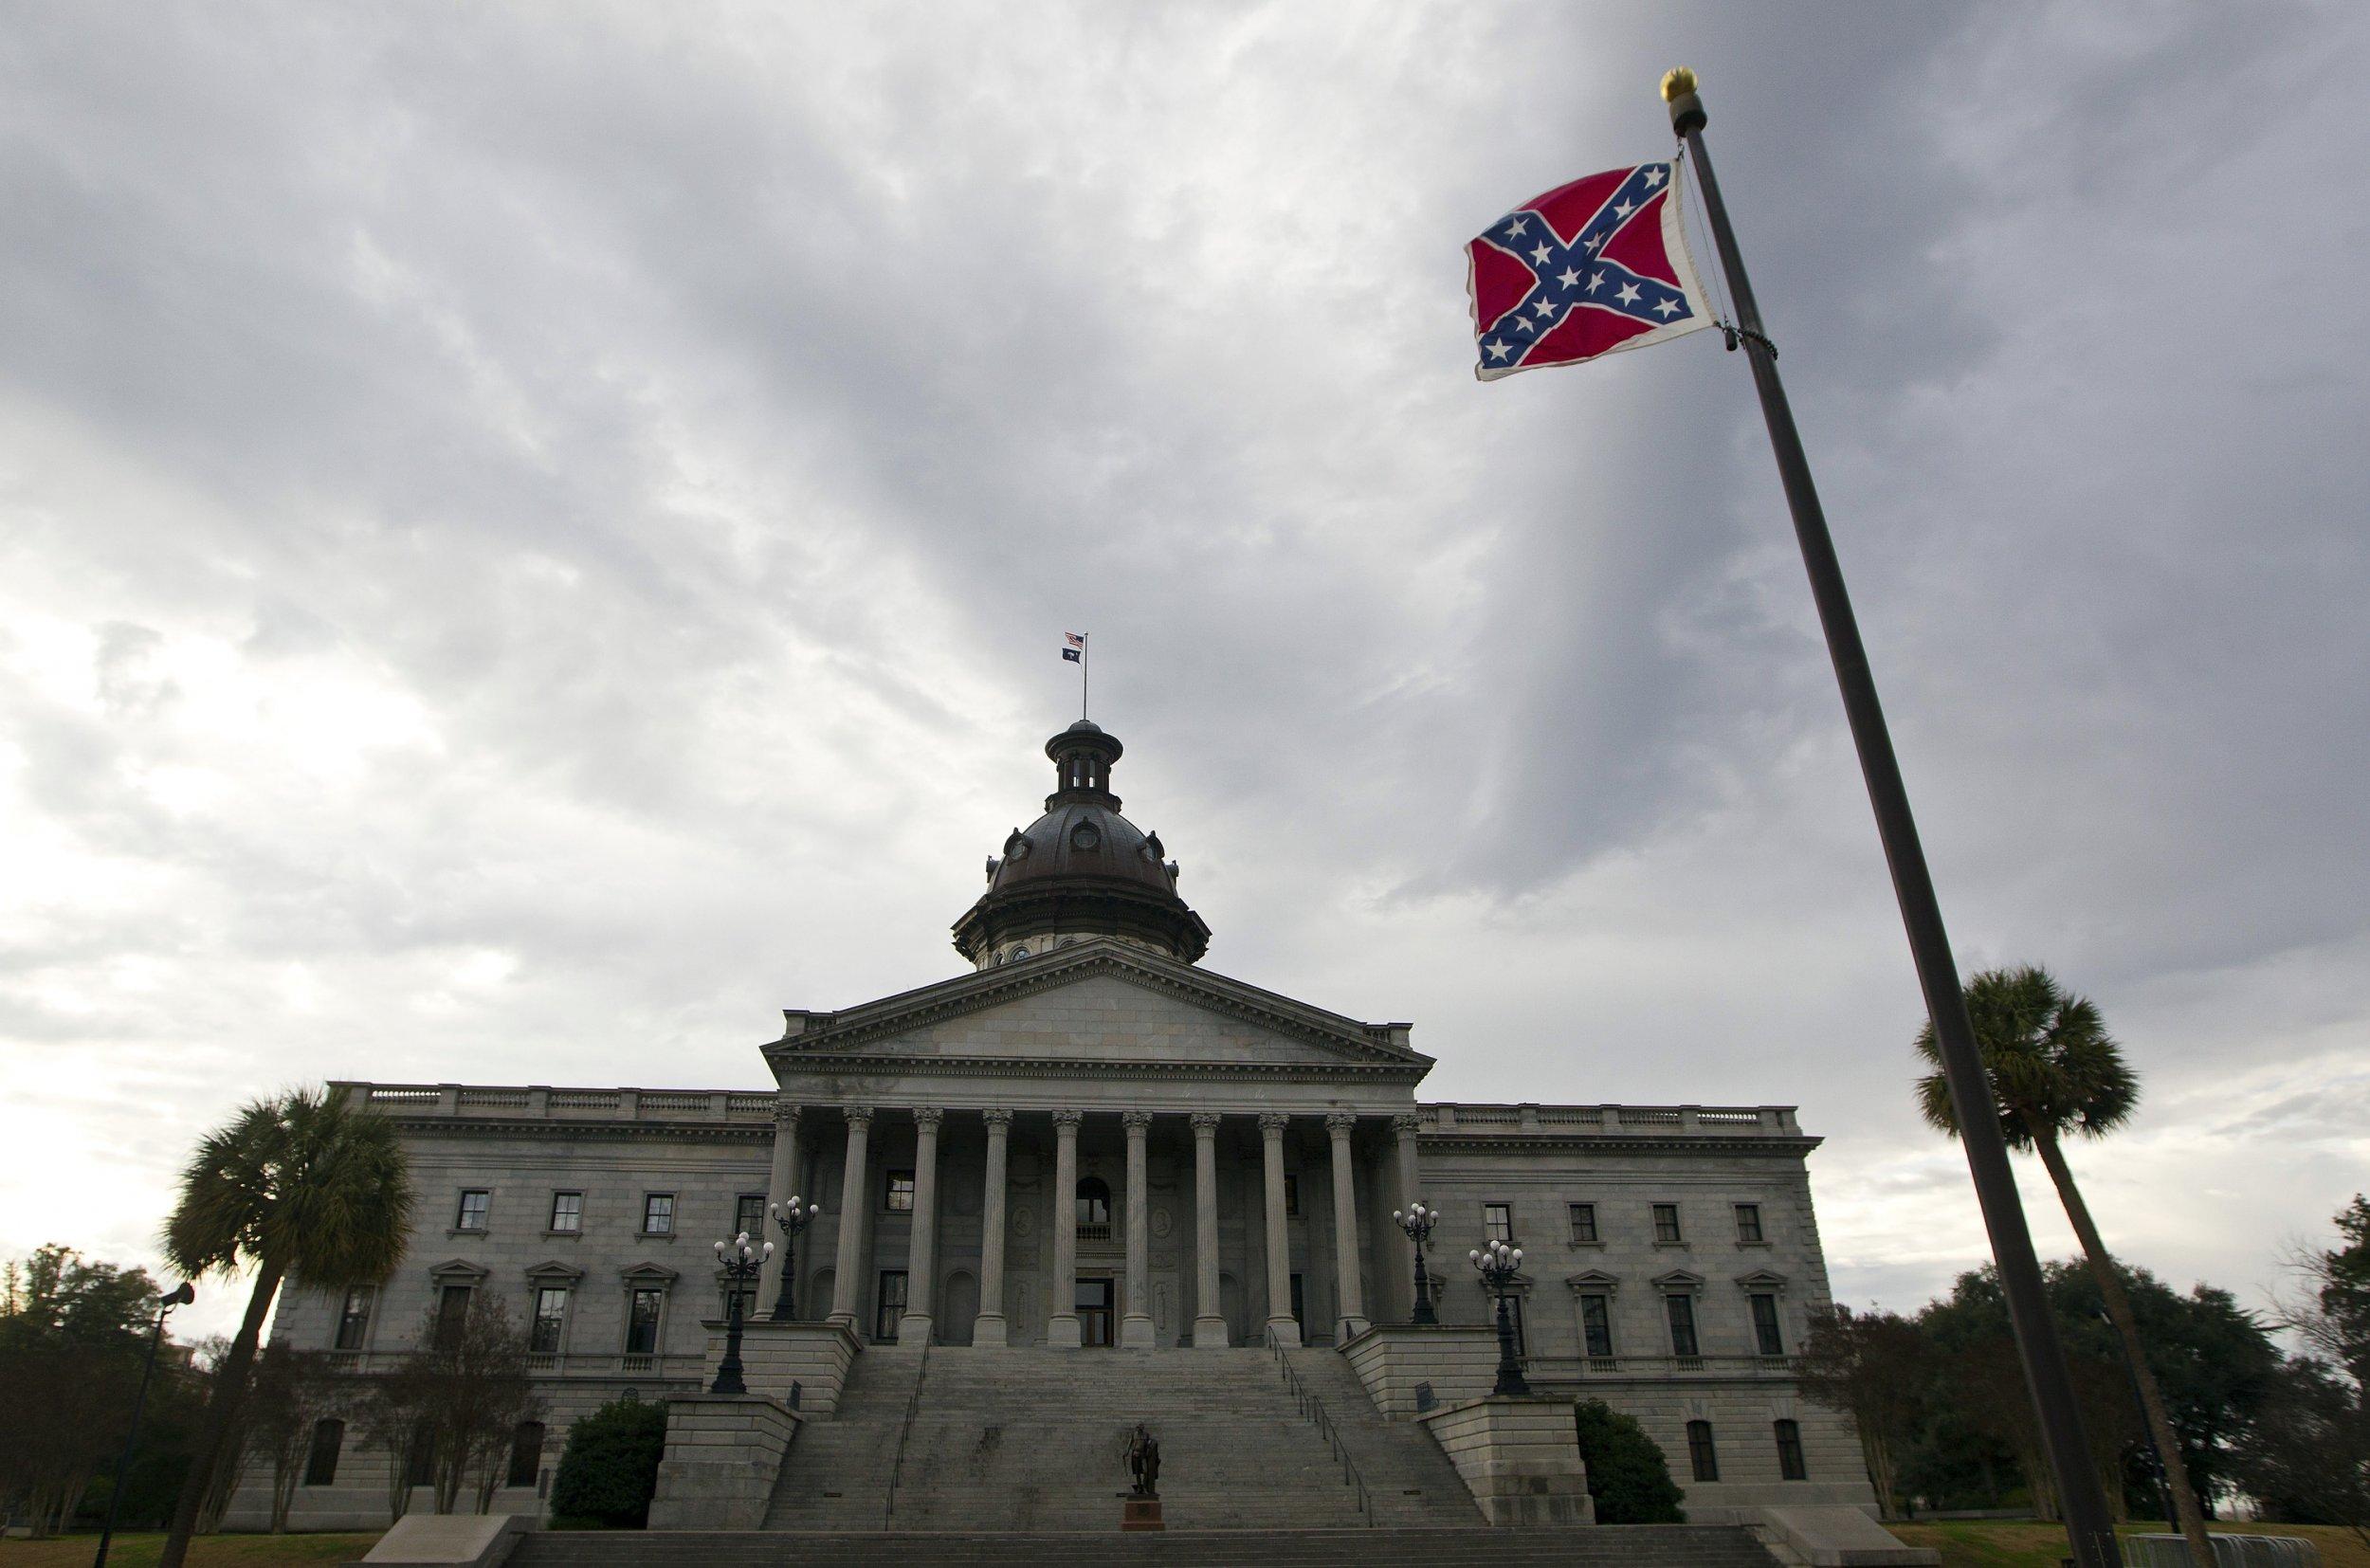 6-19-15 SC Statehouse Confederate flag